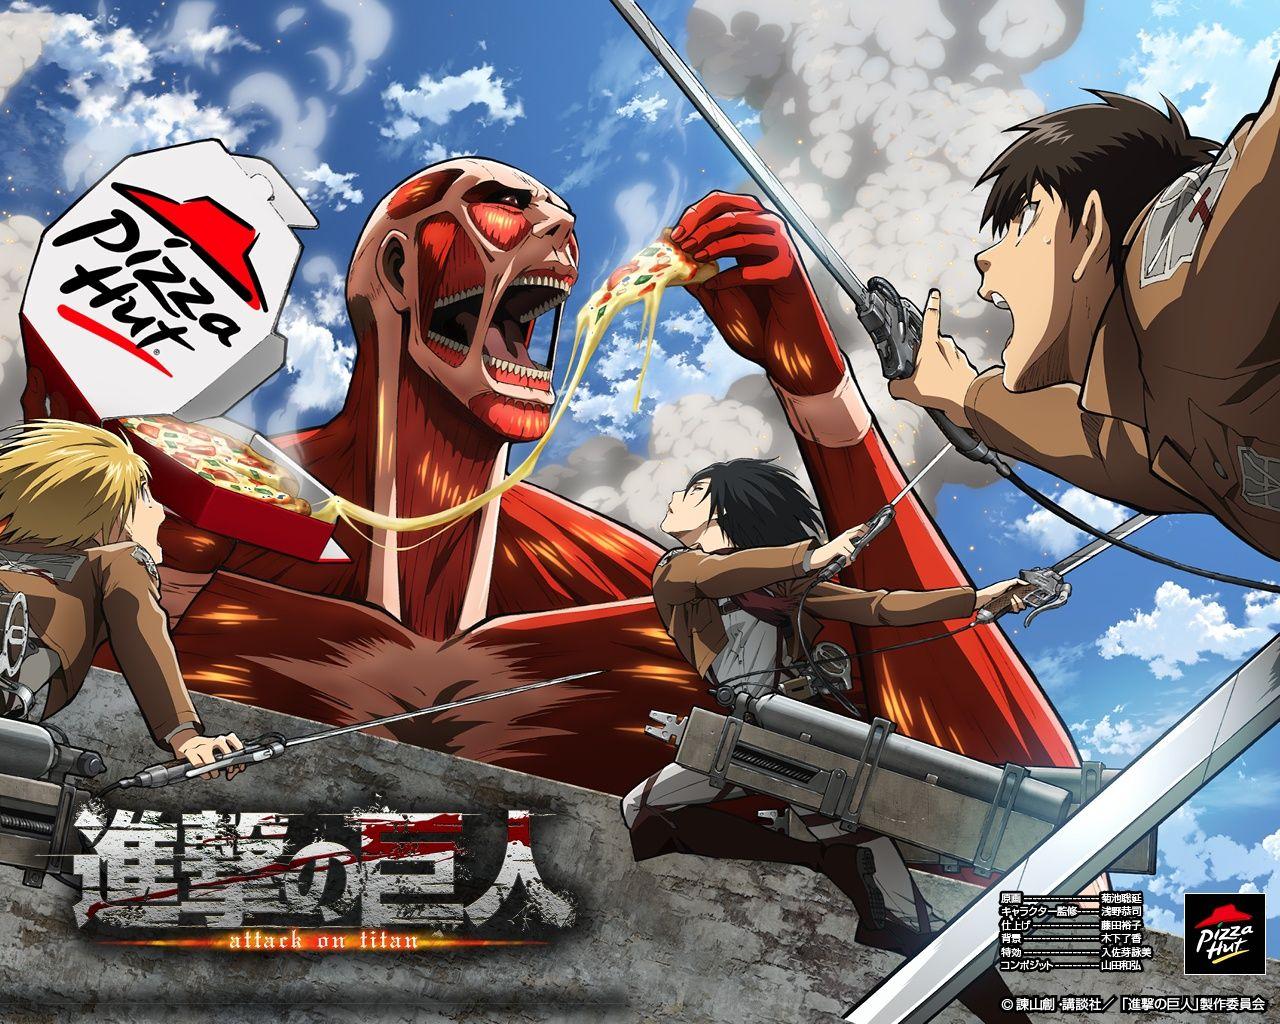 Attack on titan pizza hut advertising shingeki no kyojin